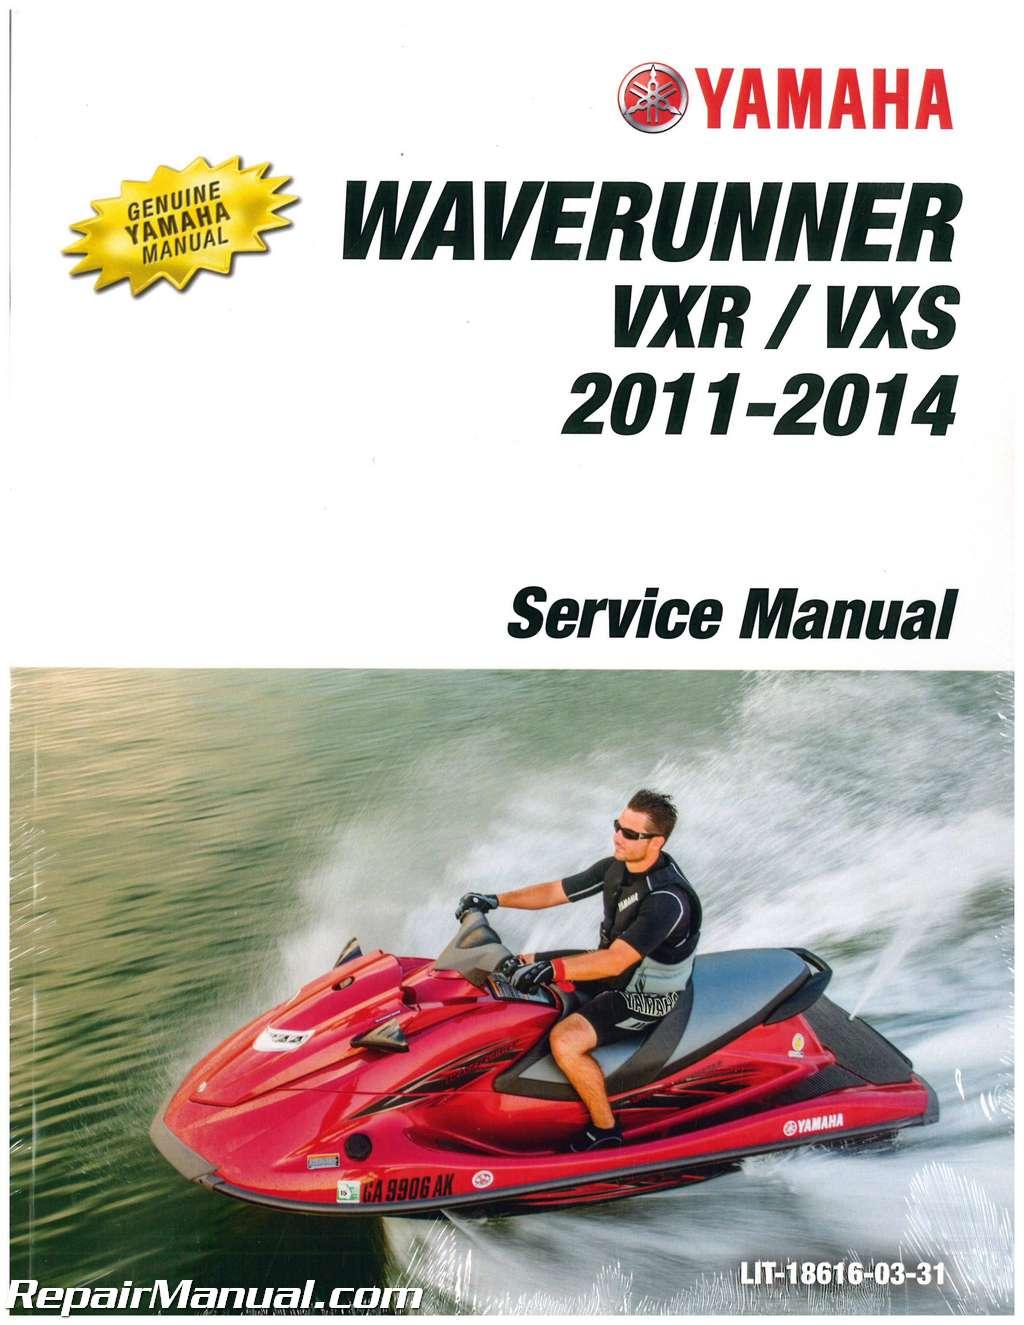 2011 2014 yamaha vx1800 waverunner vxr vxs service manual rh repairmanual com Yamaha Waverunner XL700 Manual Online yamaha waverunner repair manual free